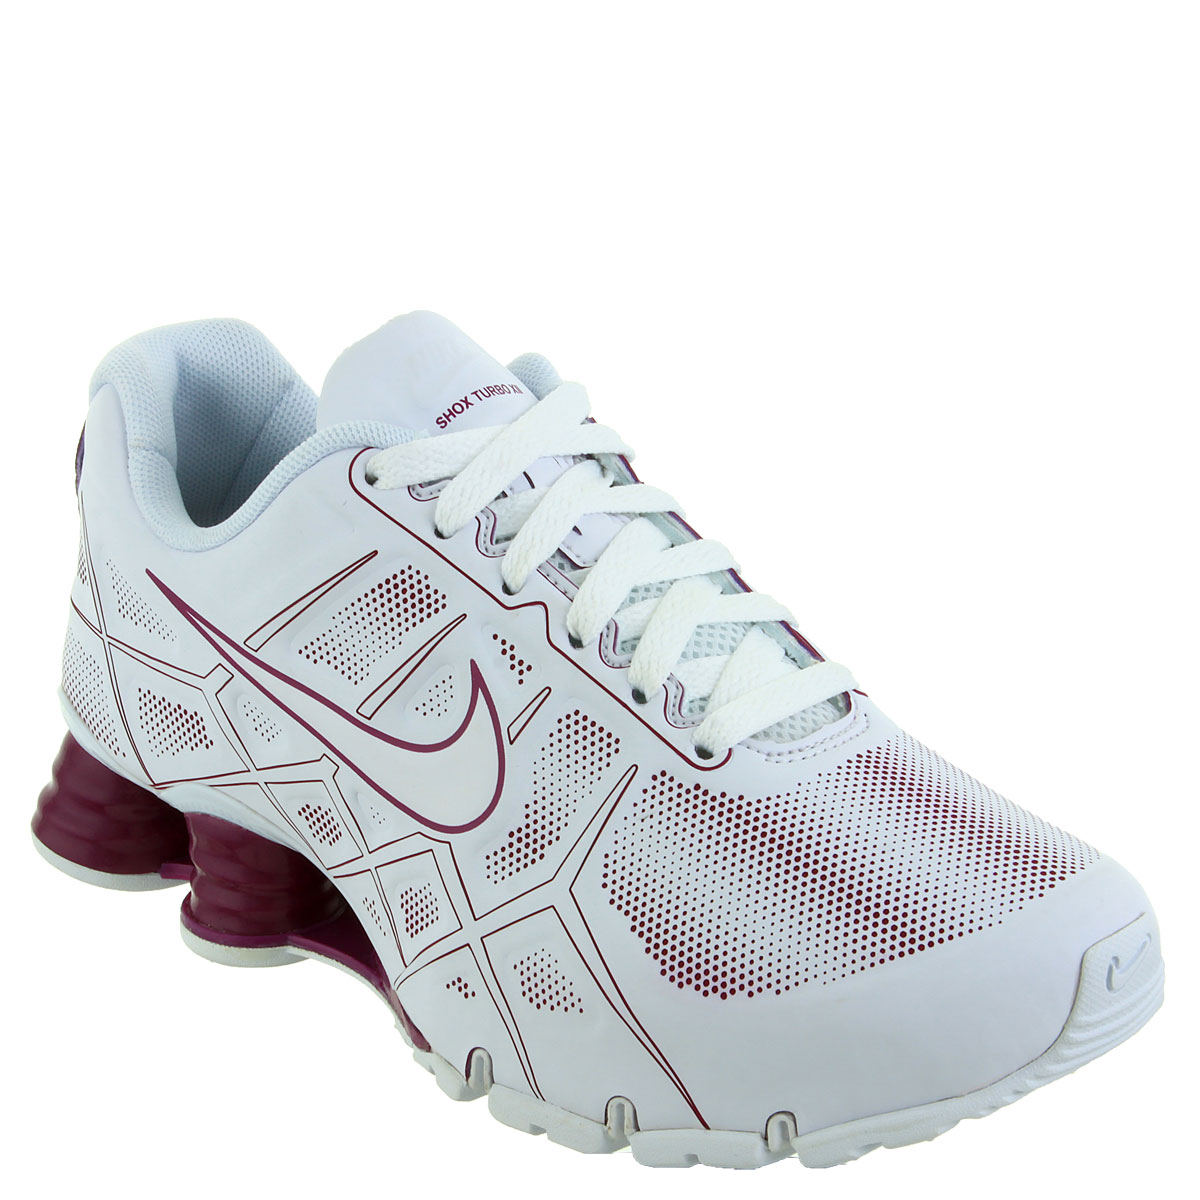 Nike Shox Turbo XII SL Running Shoes Womens   eBay